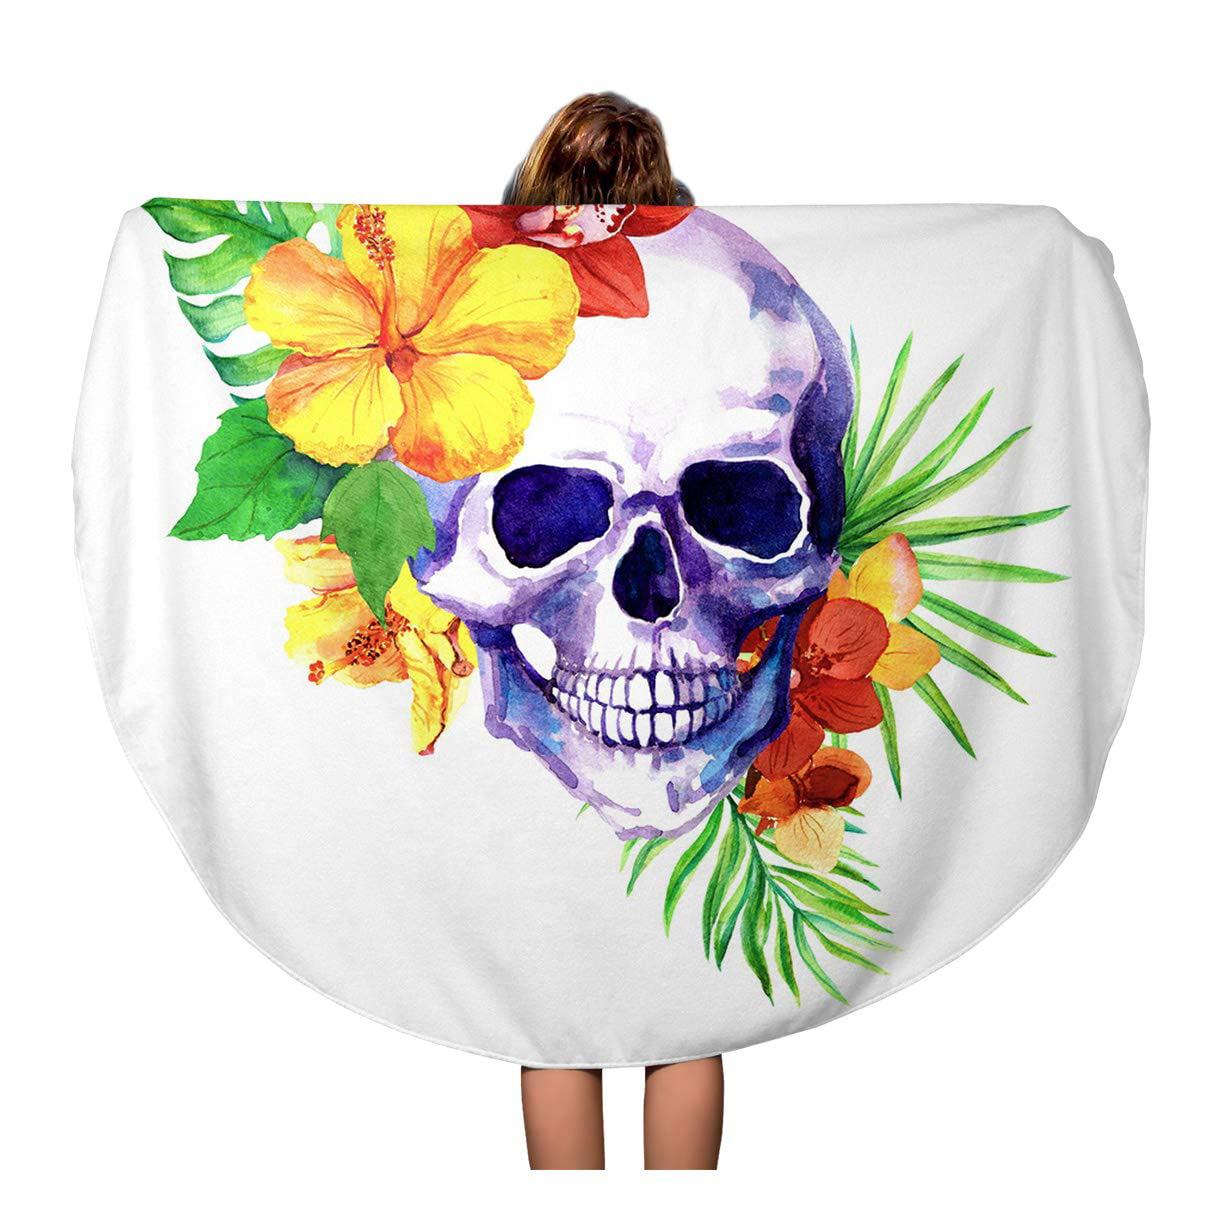 Sidonku 60 Inch Round Beach Towel Blanket Colorful Human Skull Exotic Leaves Tropical Flowers Hibiscus Orchid Travel Circle Circular Towels Mat Tapestry Beach Throw Walmart Com Walmart Com